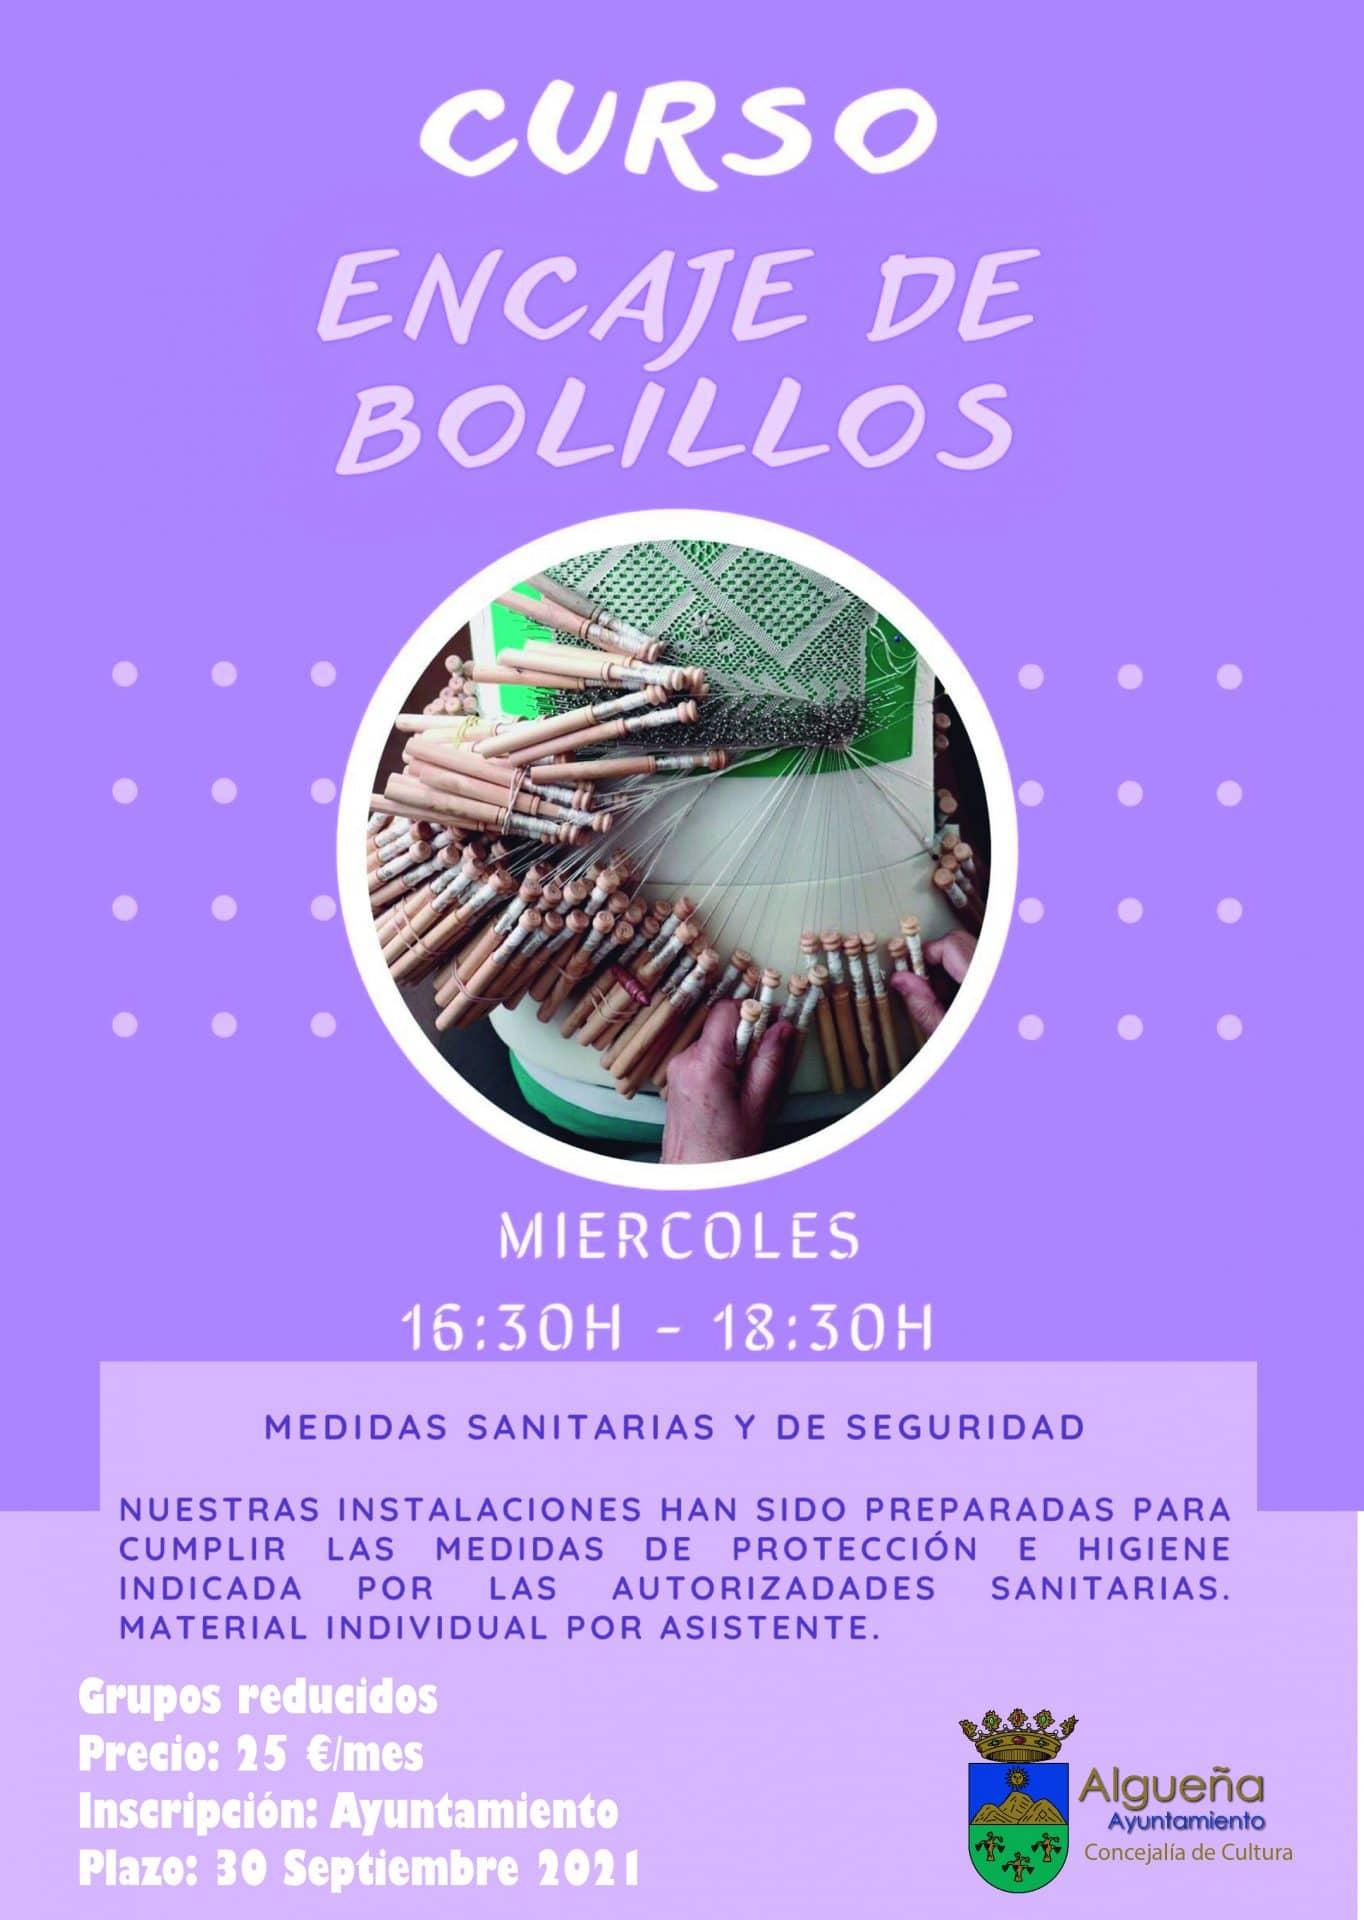 CURSO ENCAJE DE BOLILLOS